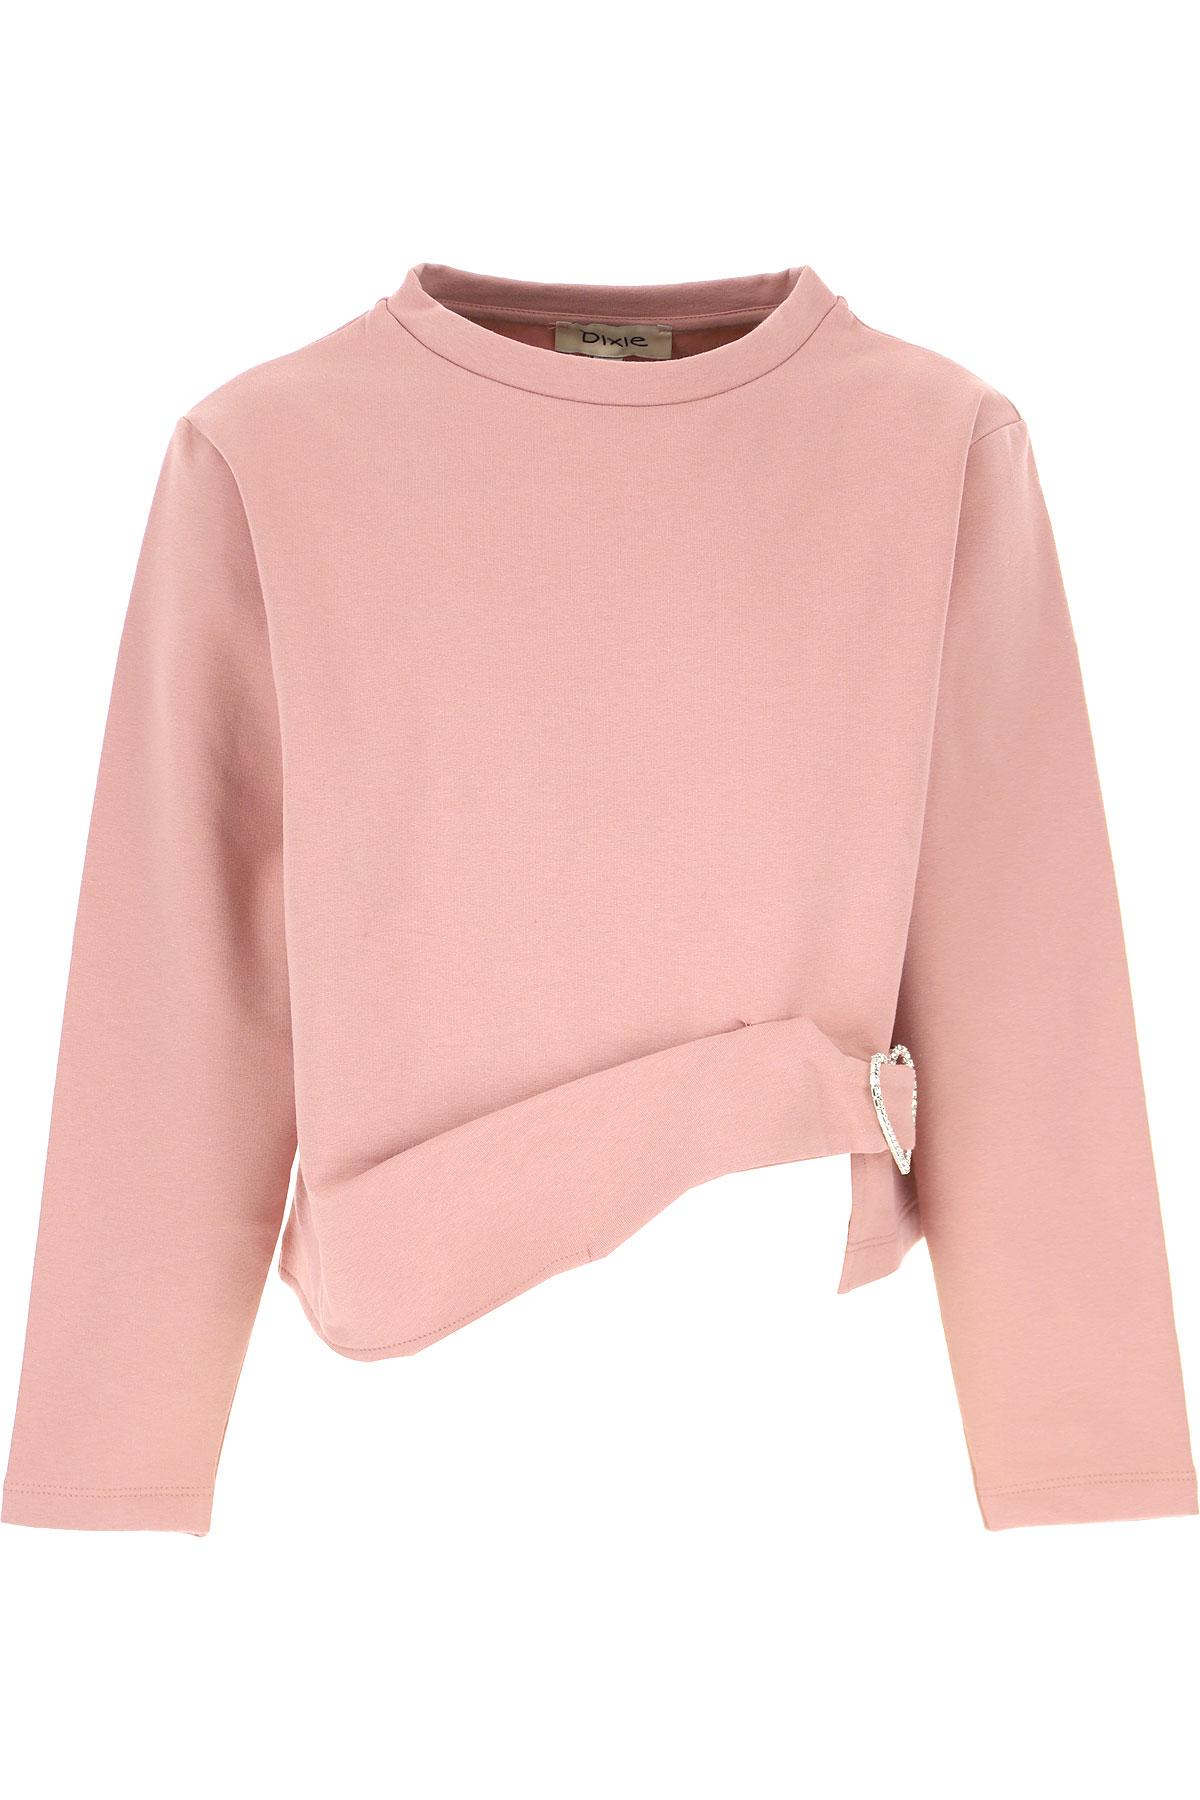 Dixie Kids Sweatshirts & Hoodies for Girls On Sale, Antique Rose, Cotton, 2019, L M XL XXL